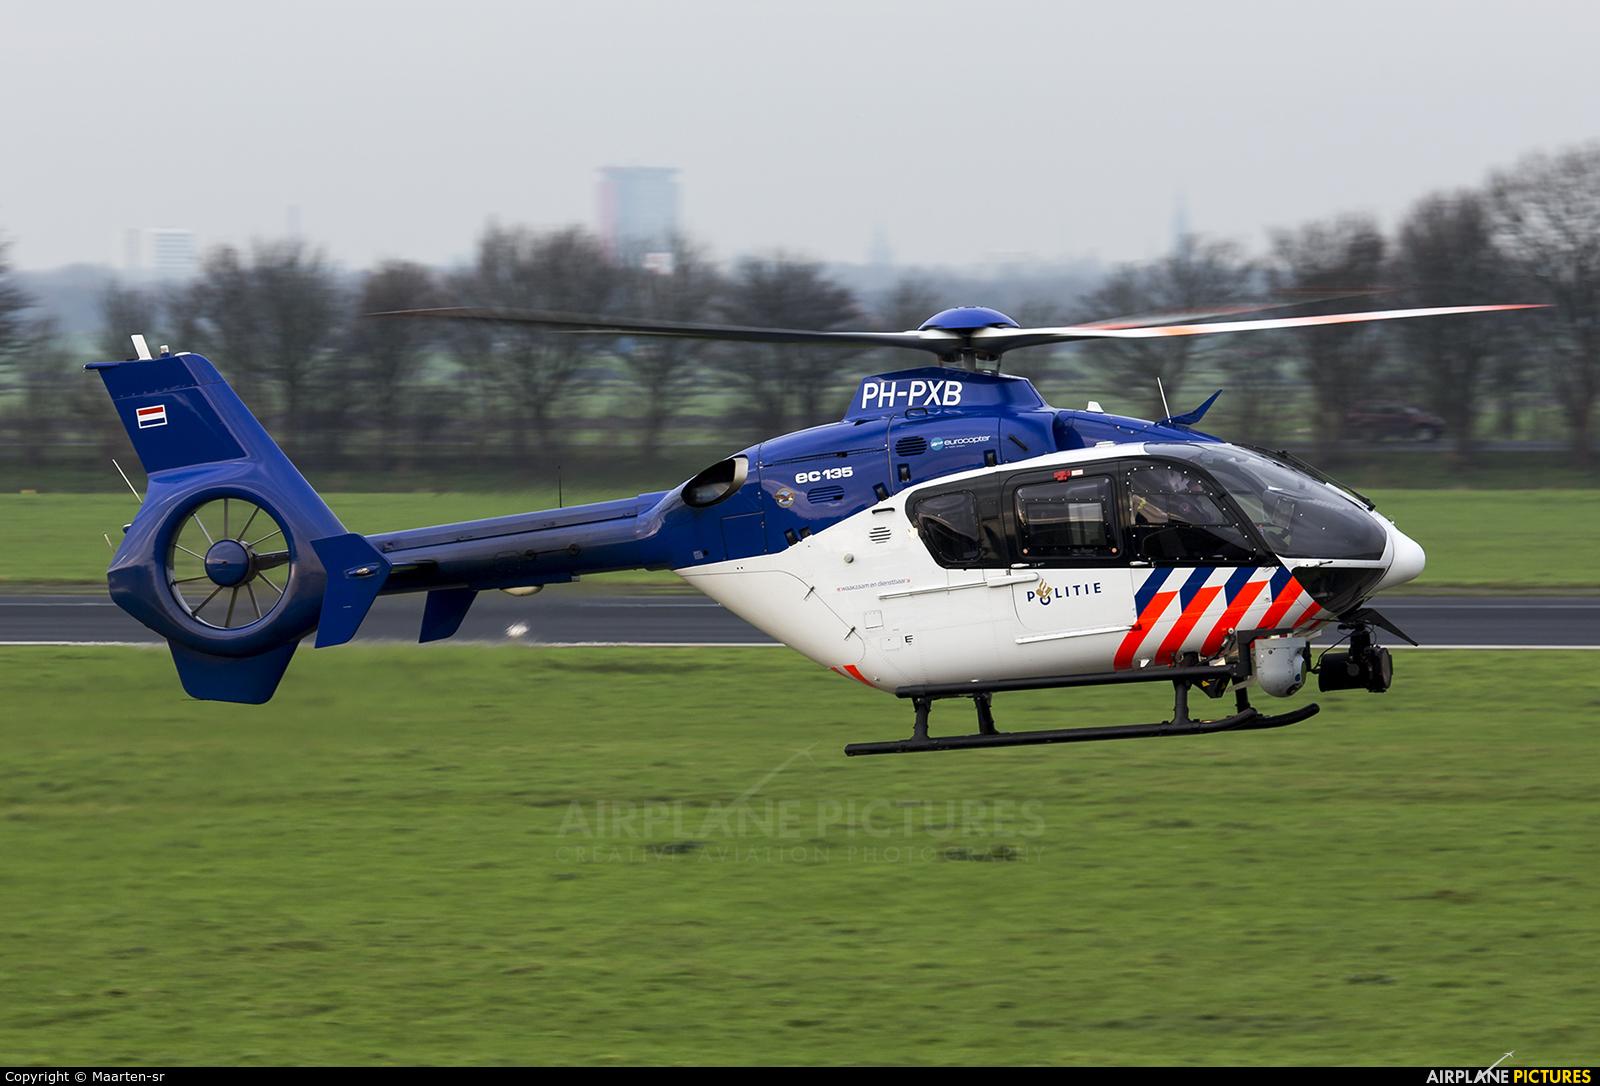 Netherlands - Police PH-PXB aircraft at Rotterdam